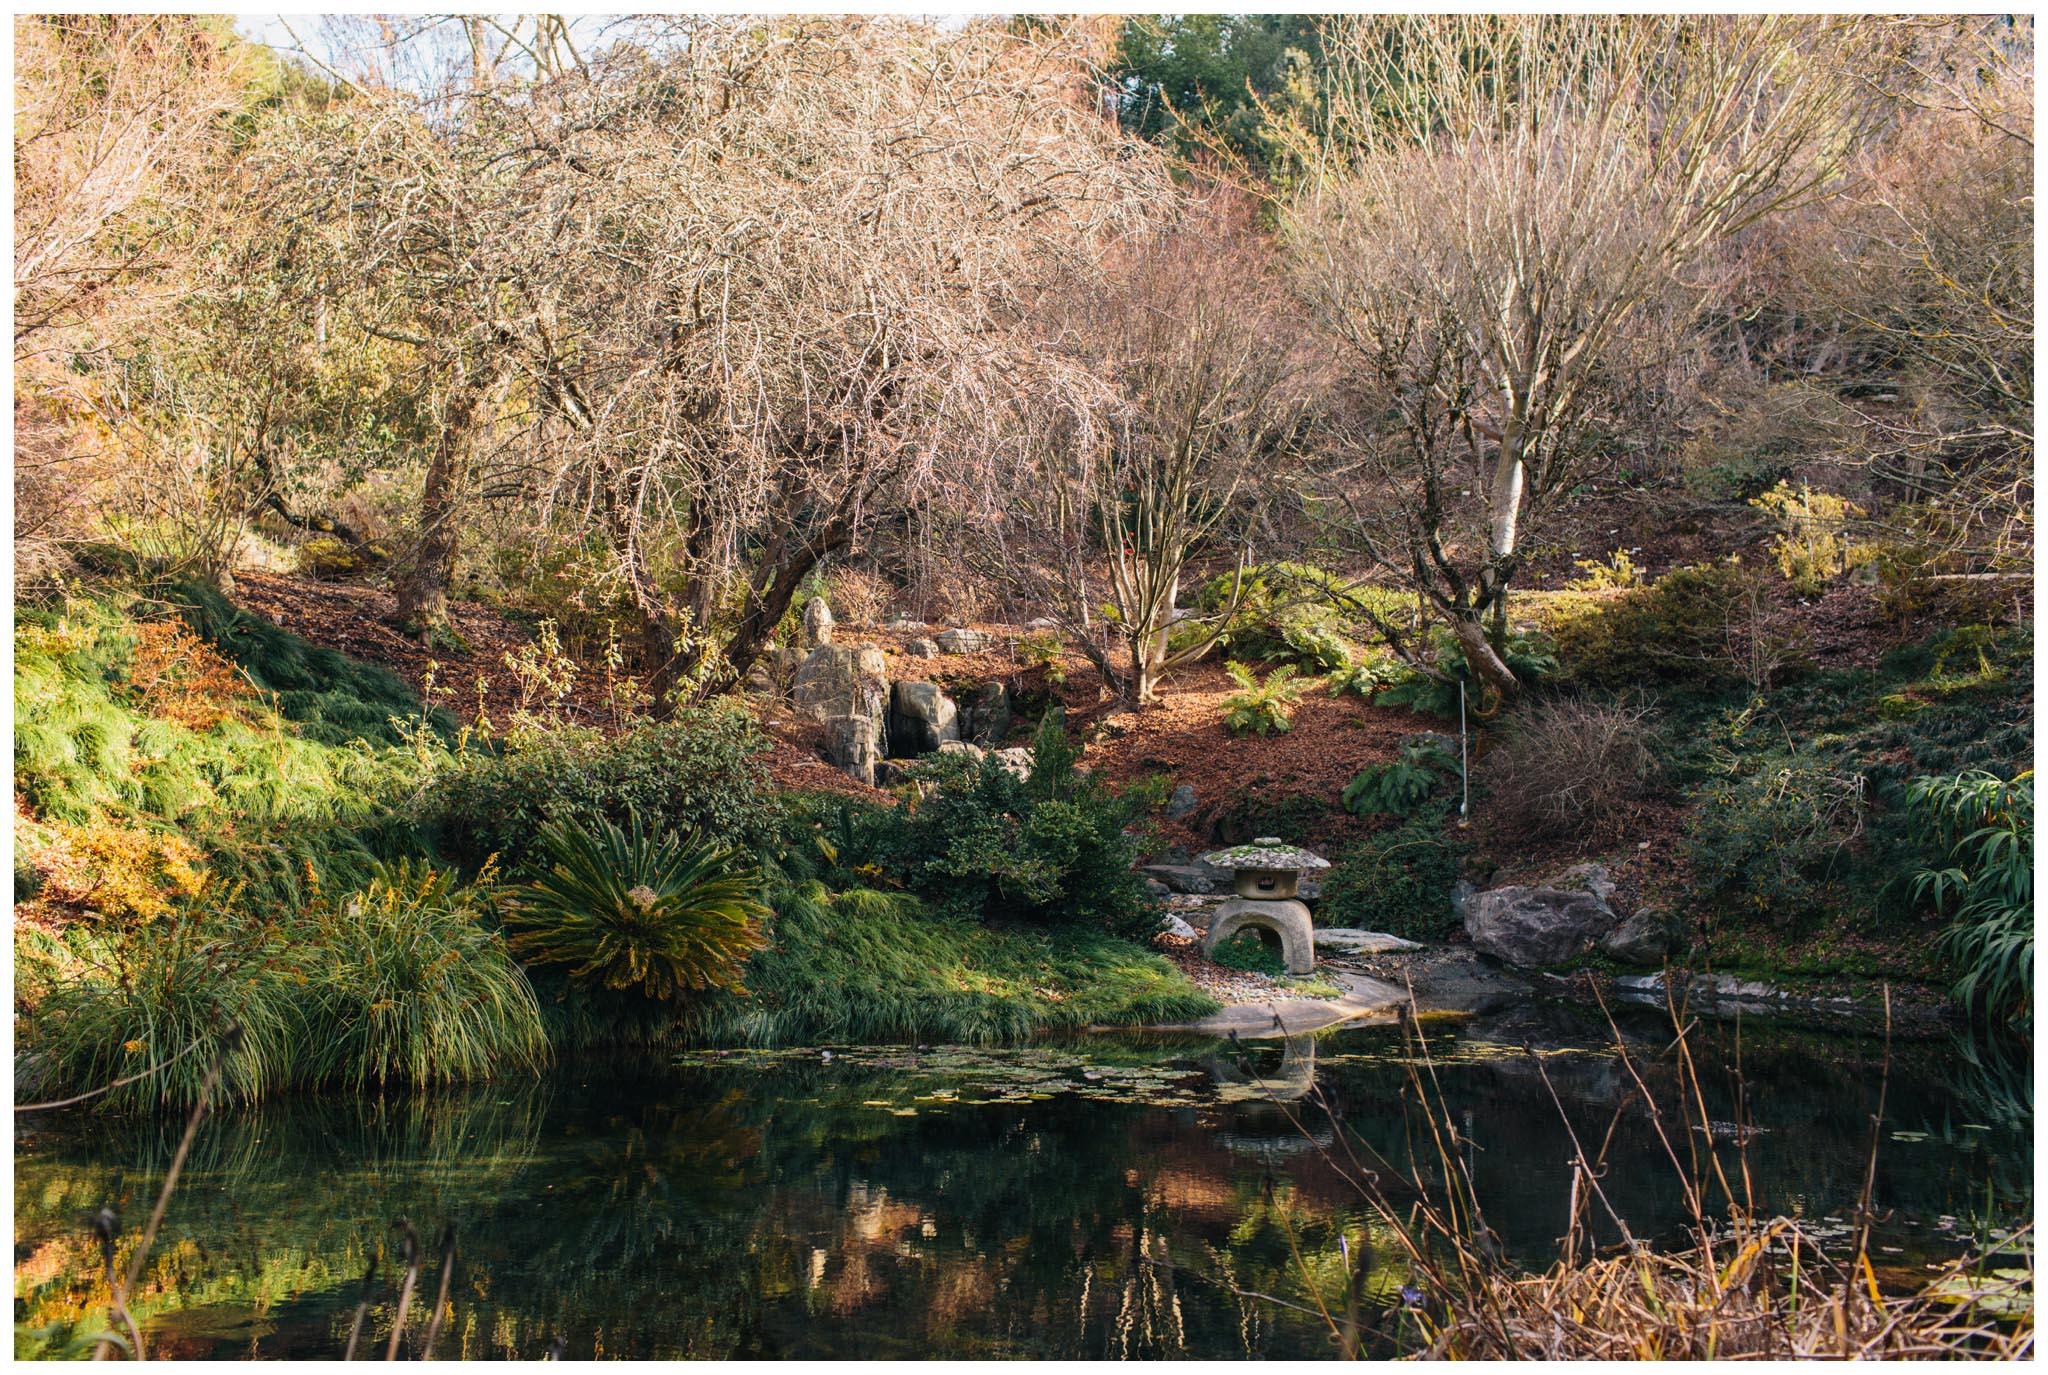 University of California Botanical Garden, wedding